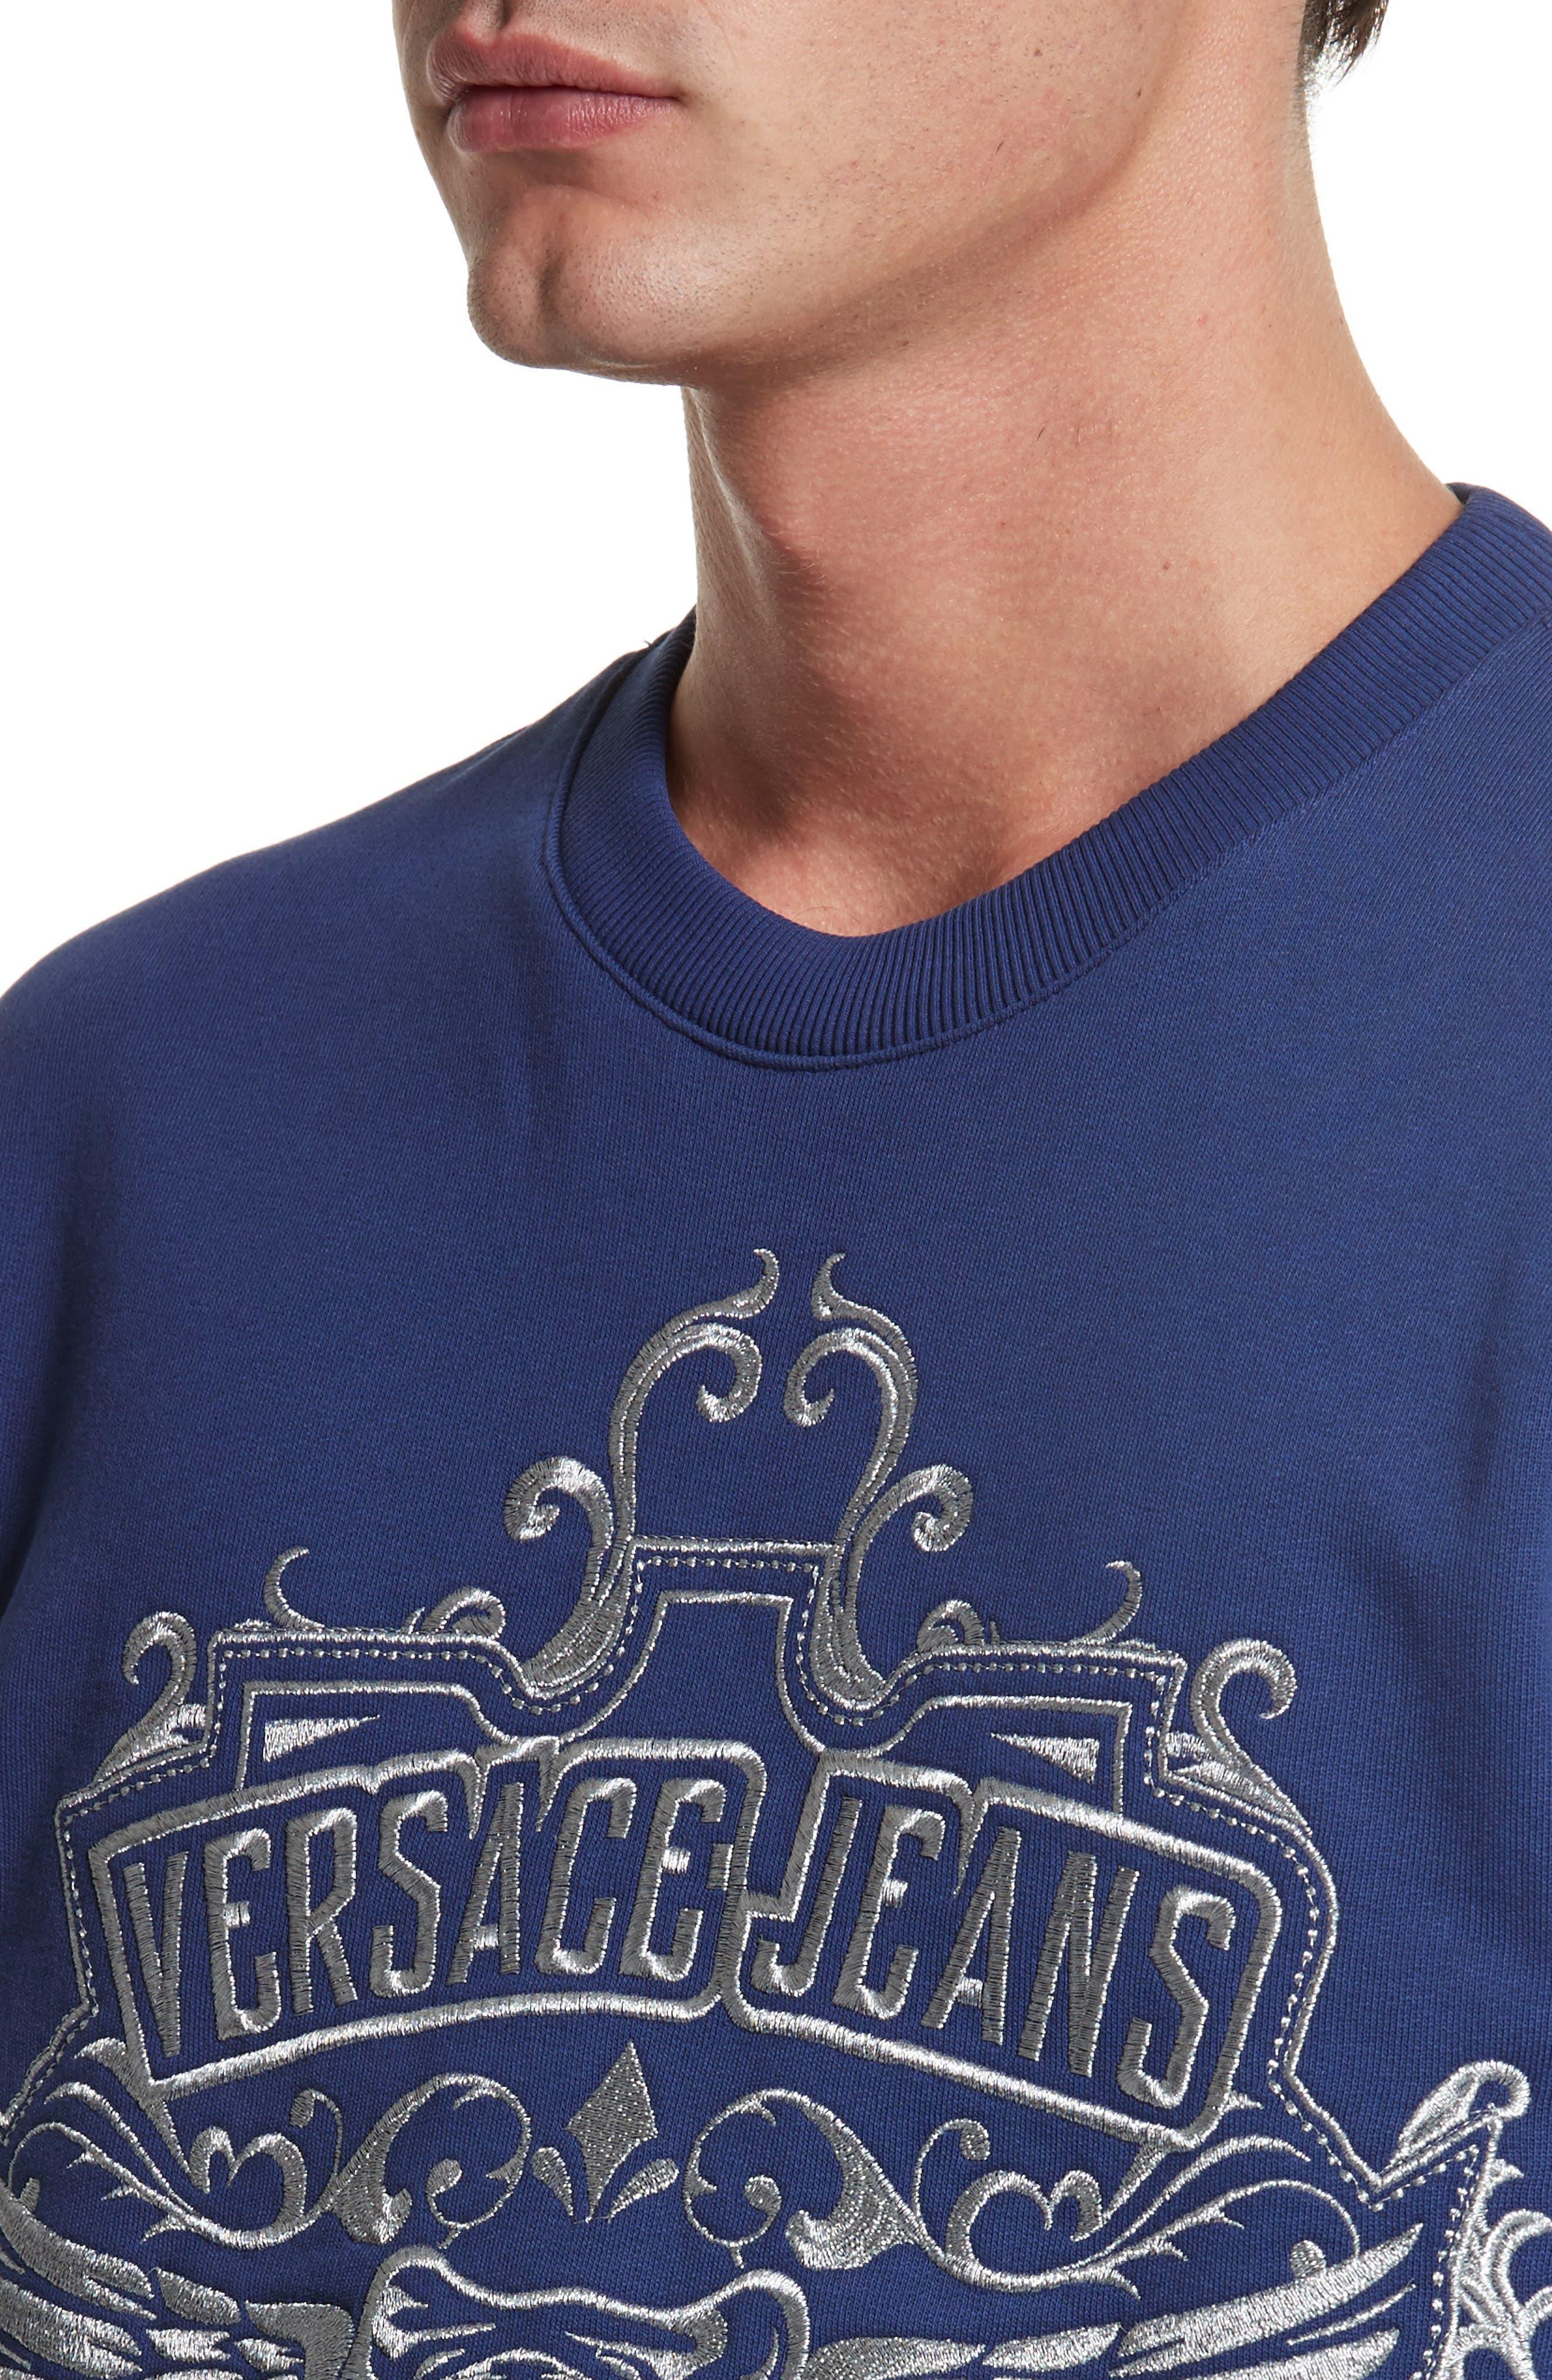 Embroidered Crewneck Sweatshirt,                             Alternate thumbnail 4, color,                             400